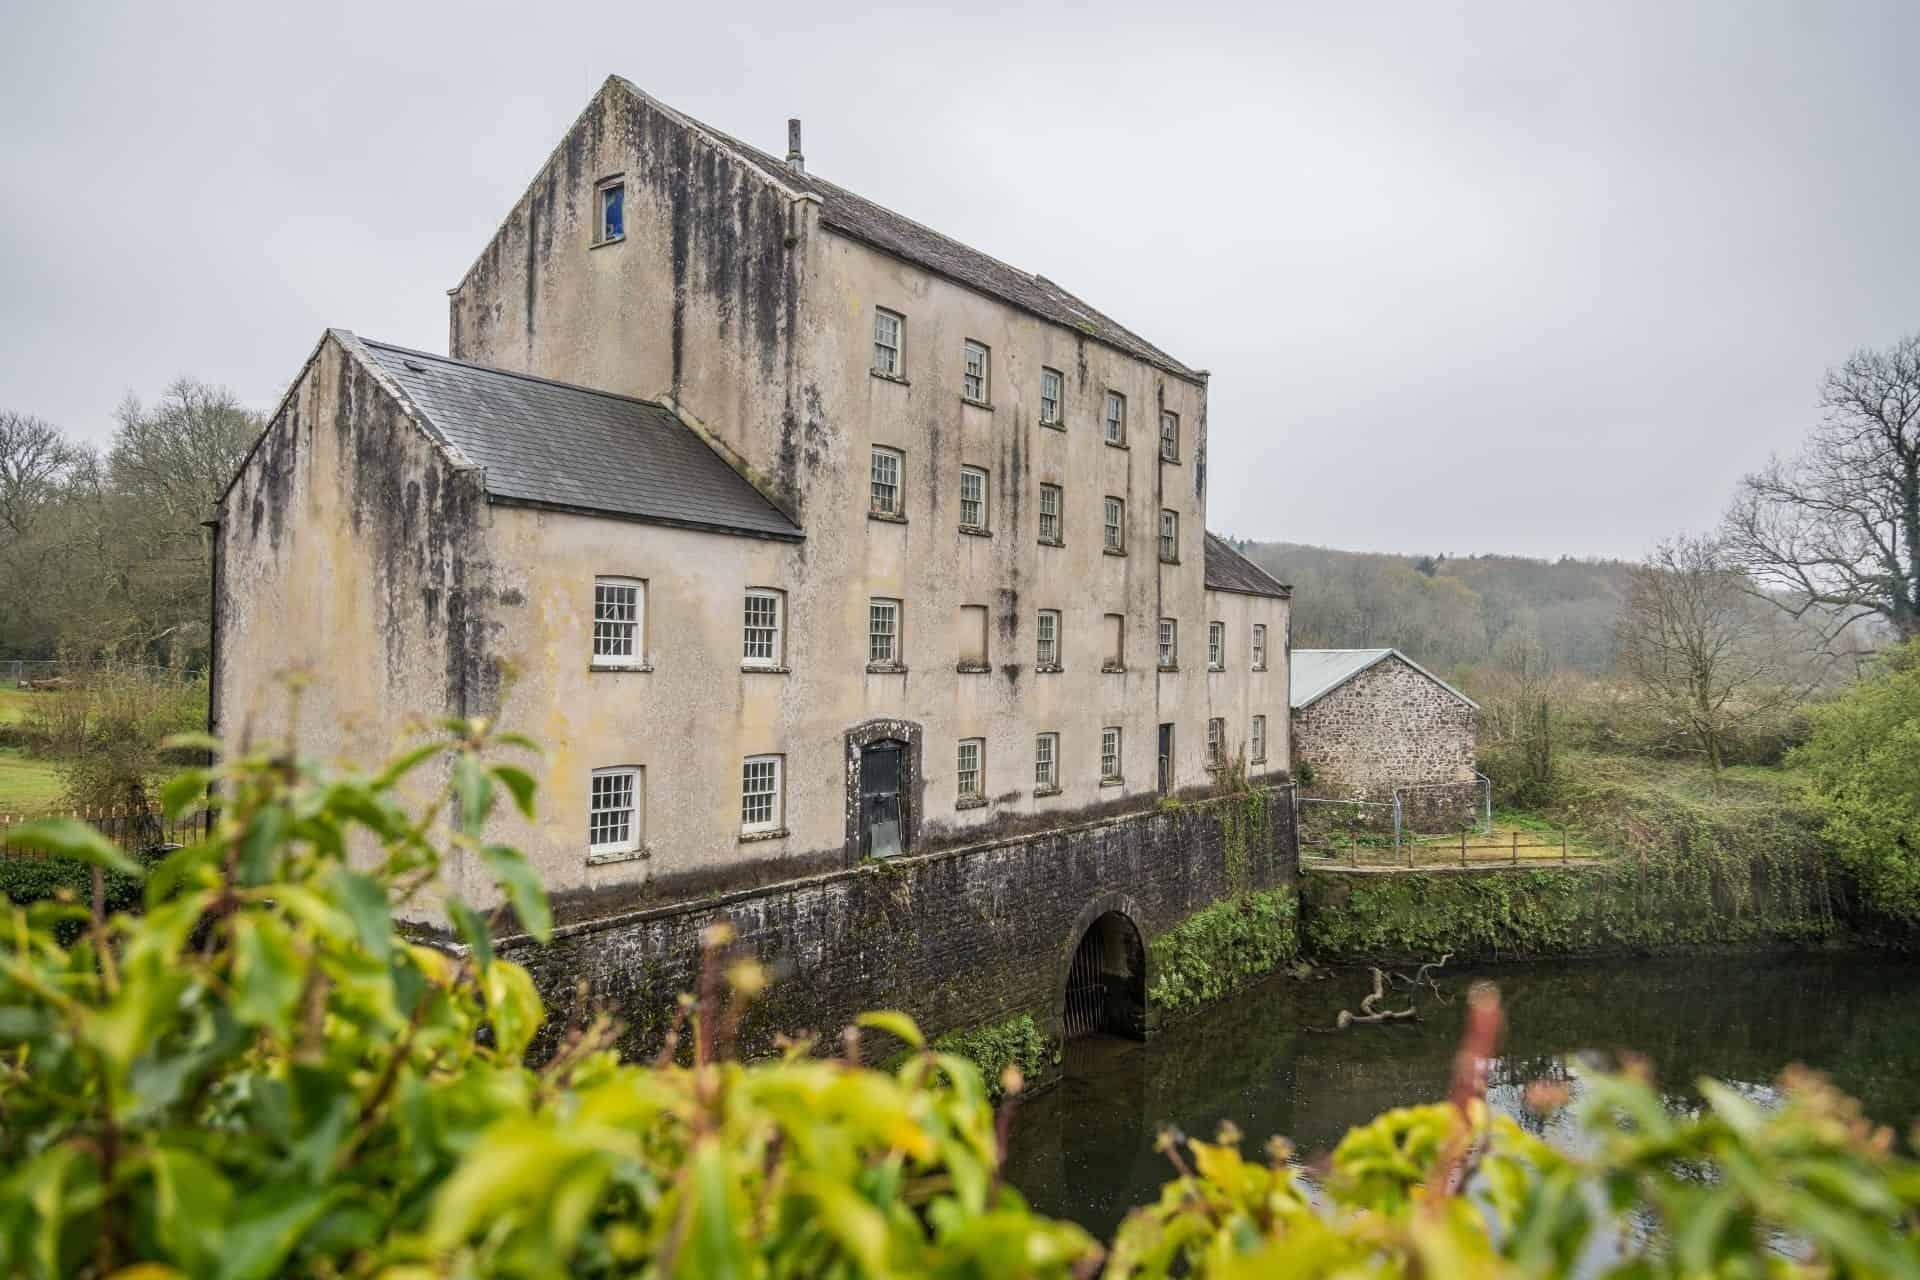 Building on a bridge in Wales